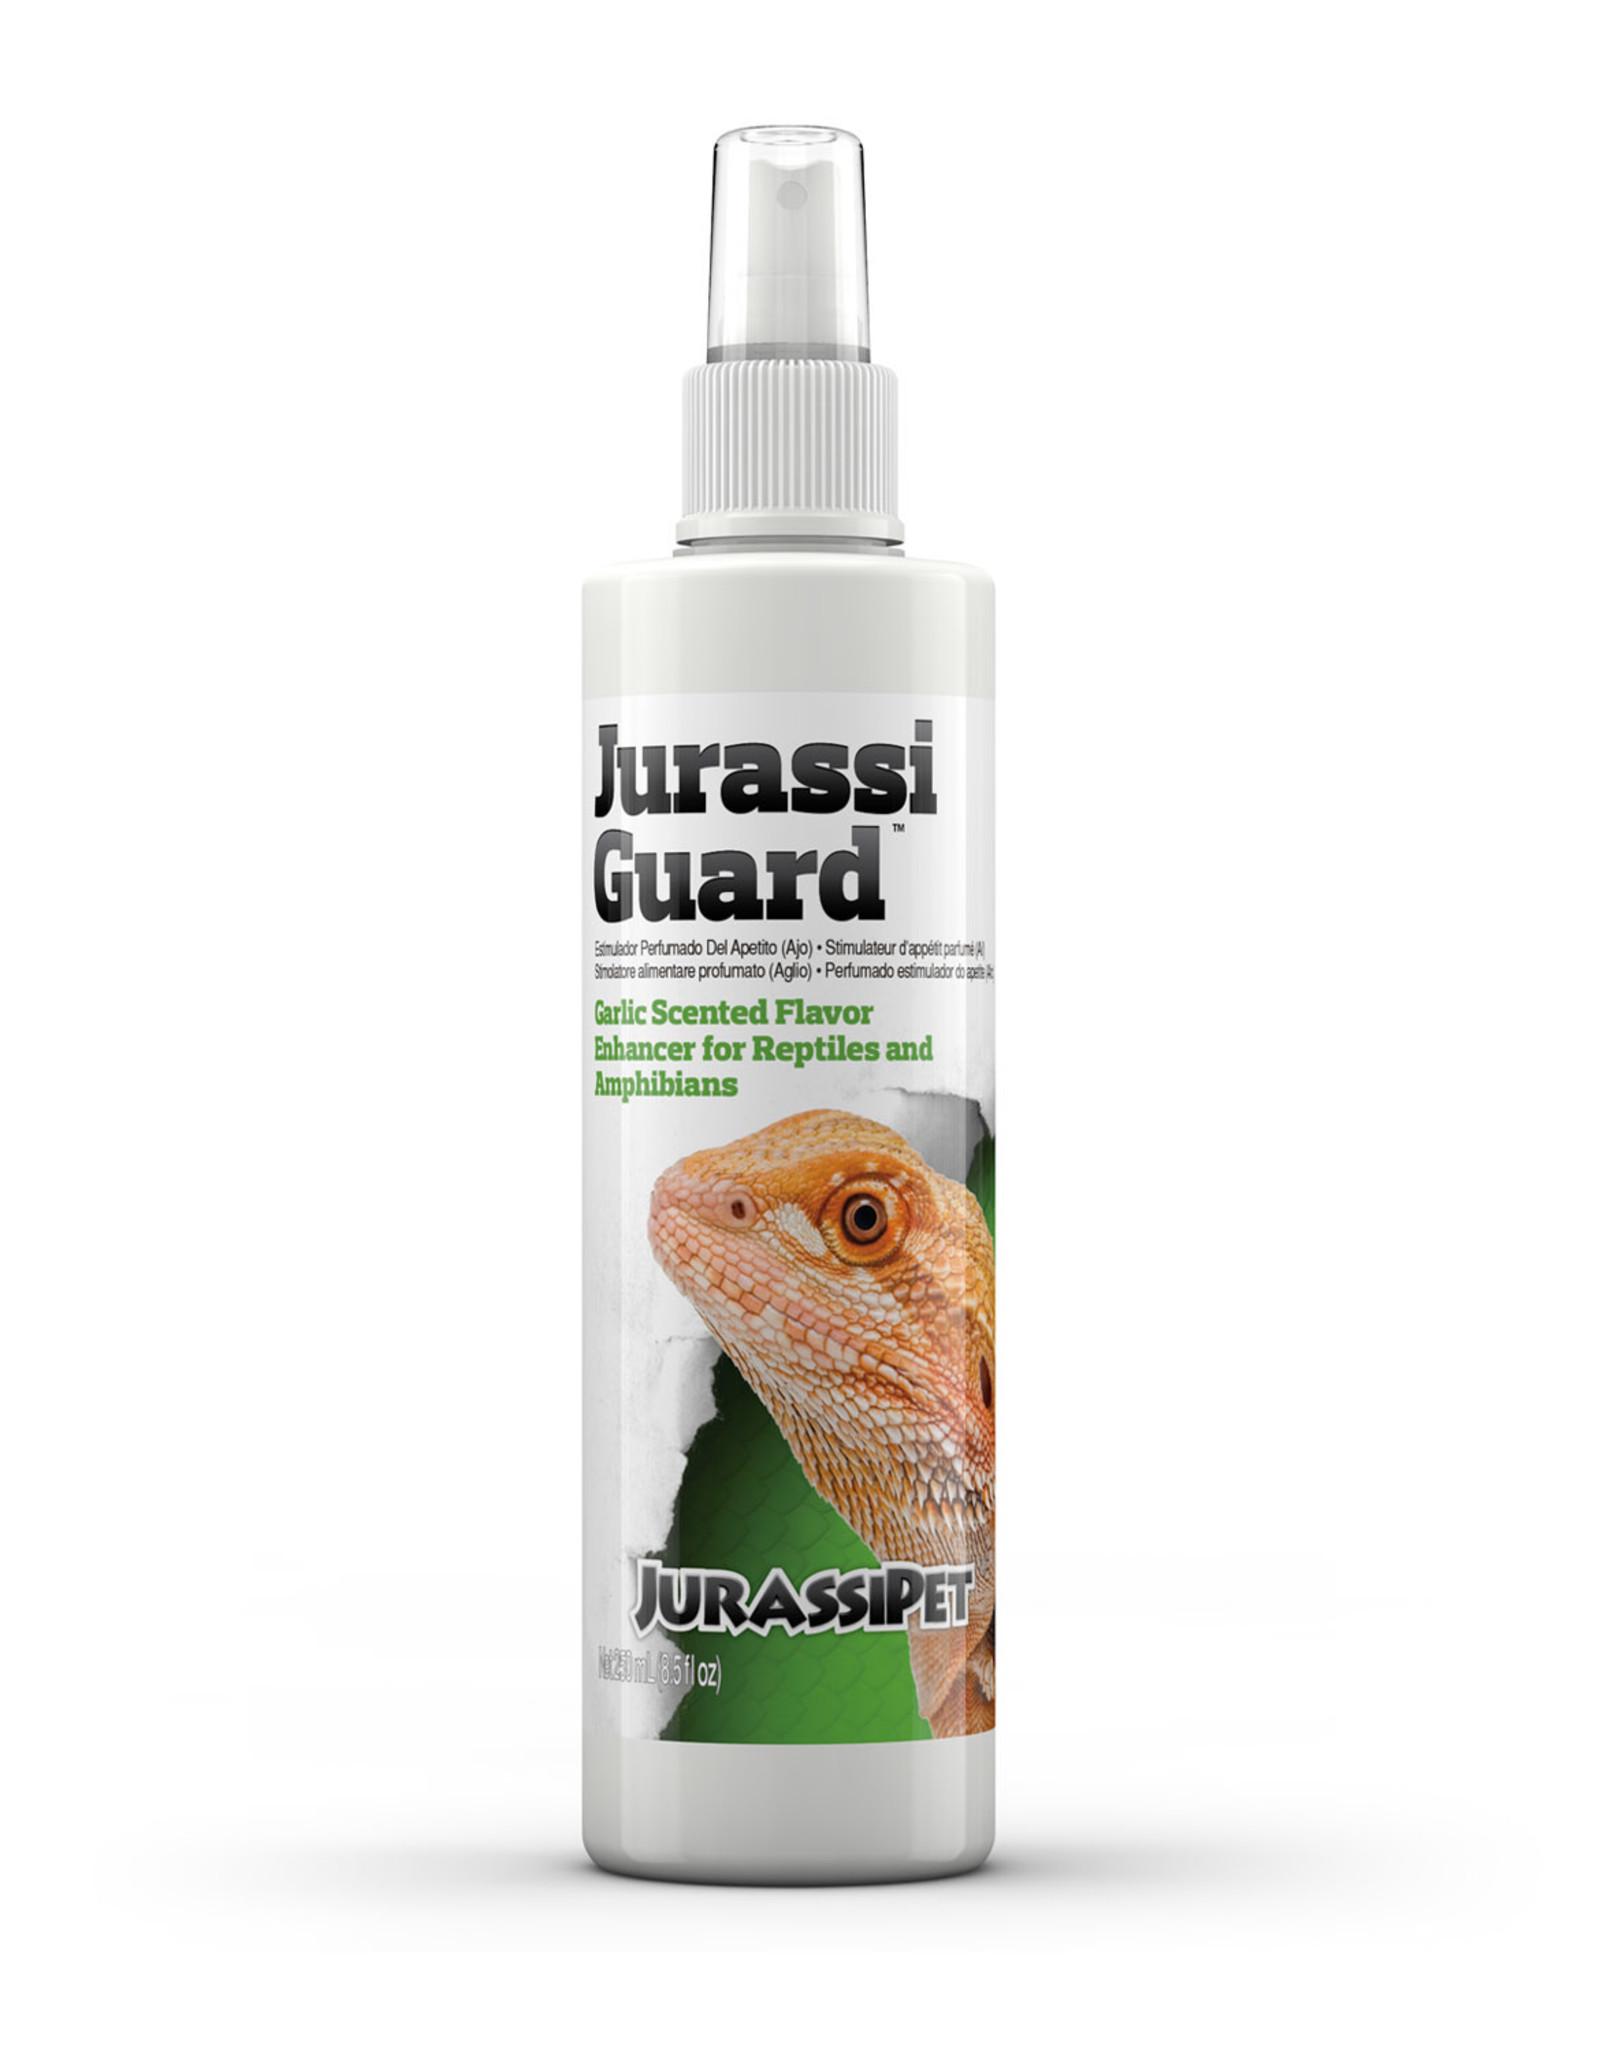 JurassiPet JURASSIPET JurassiGuard Garlic Scented Flavor 250ml